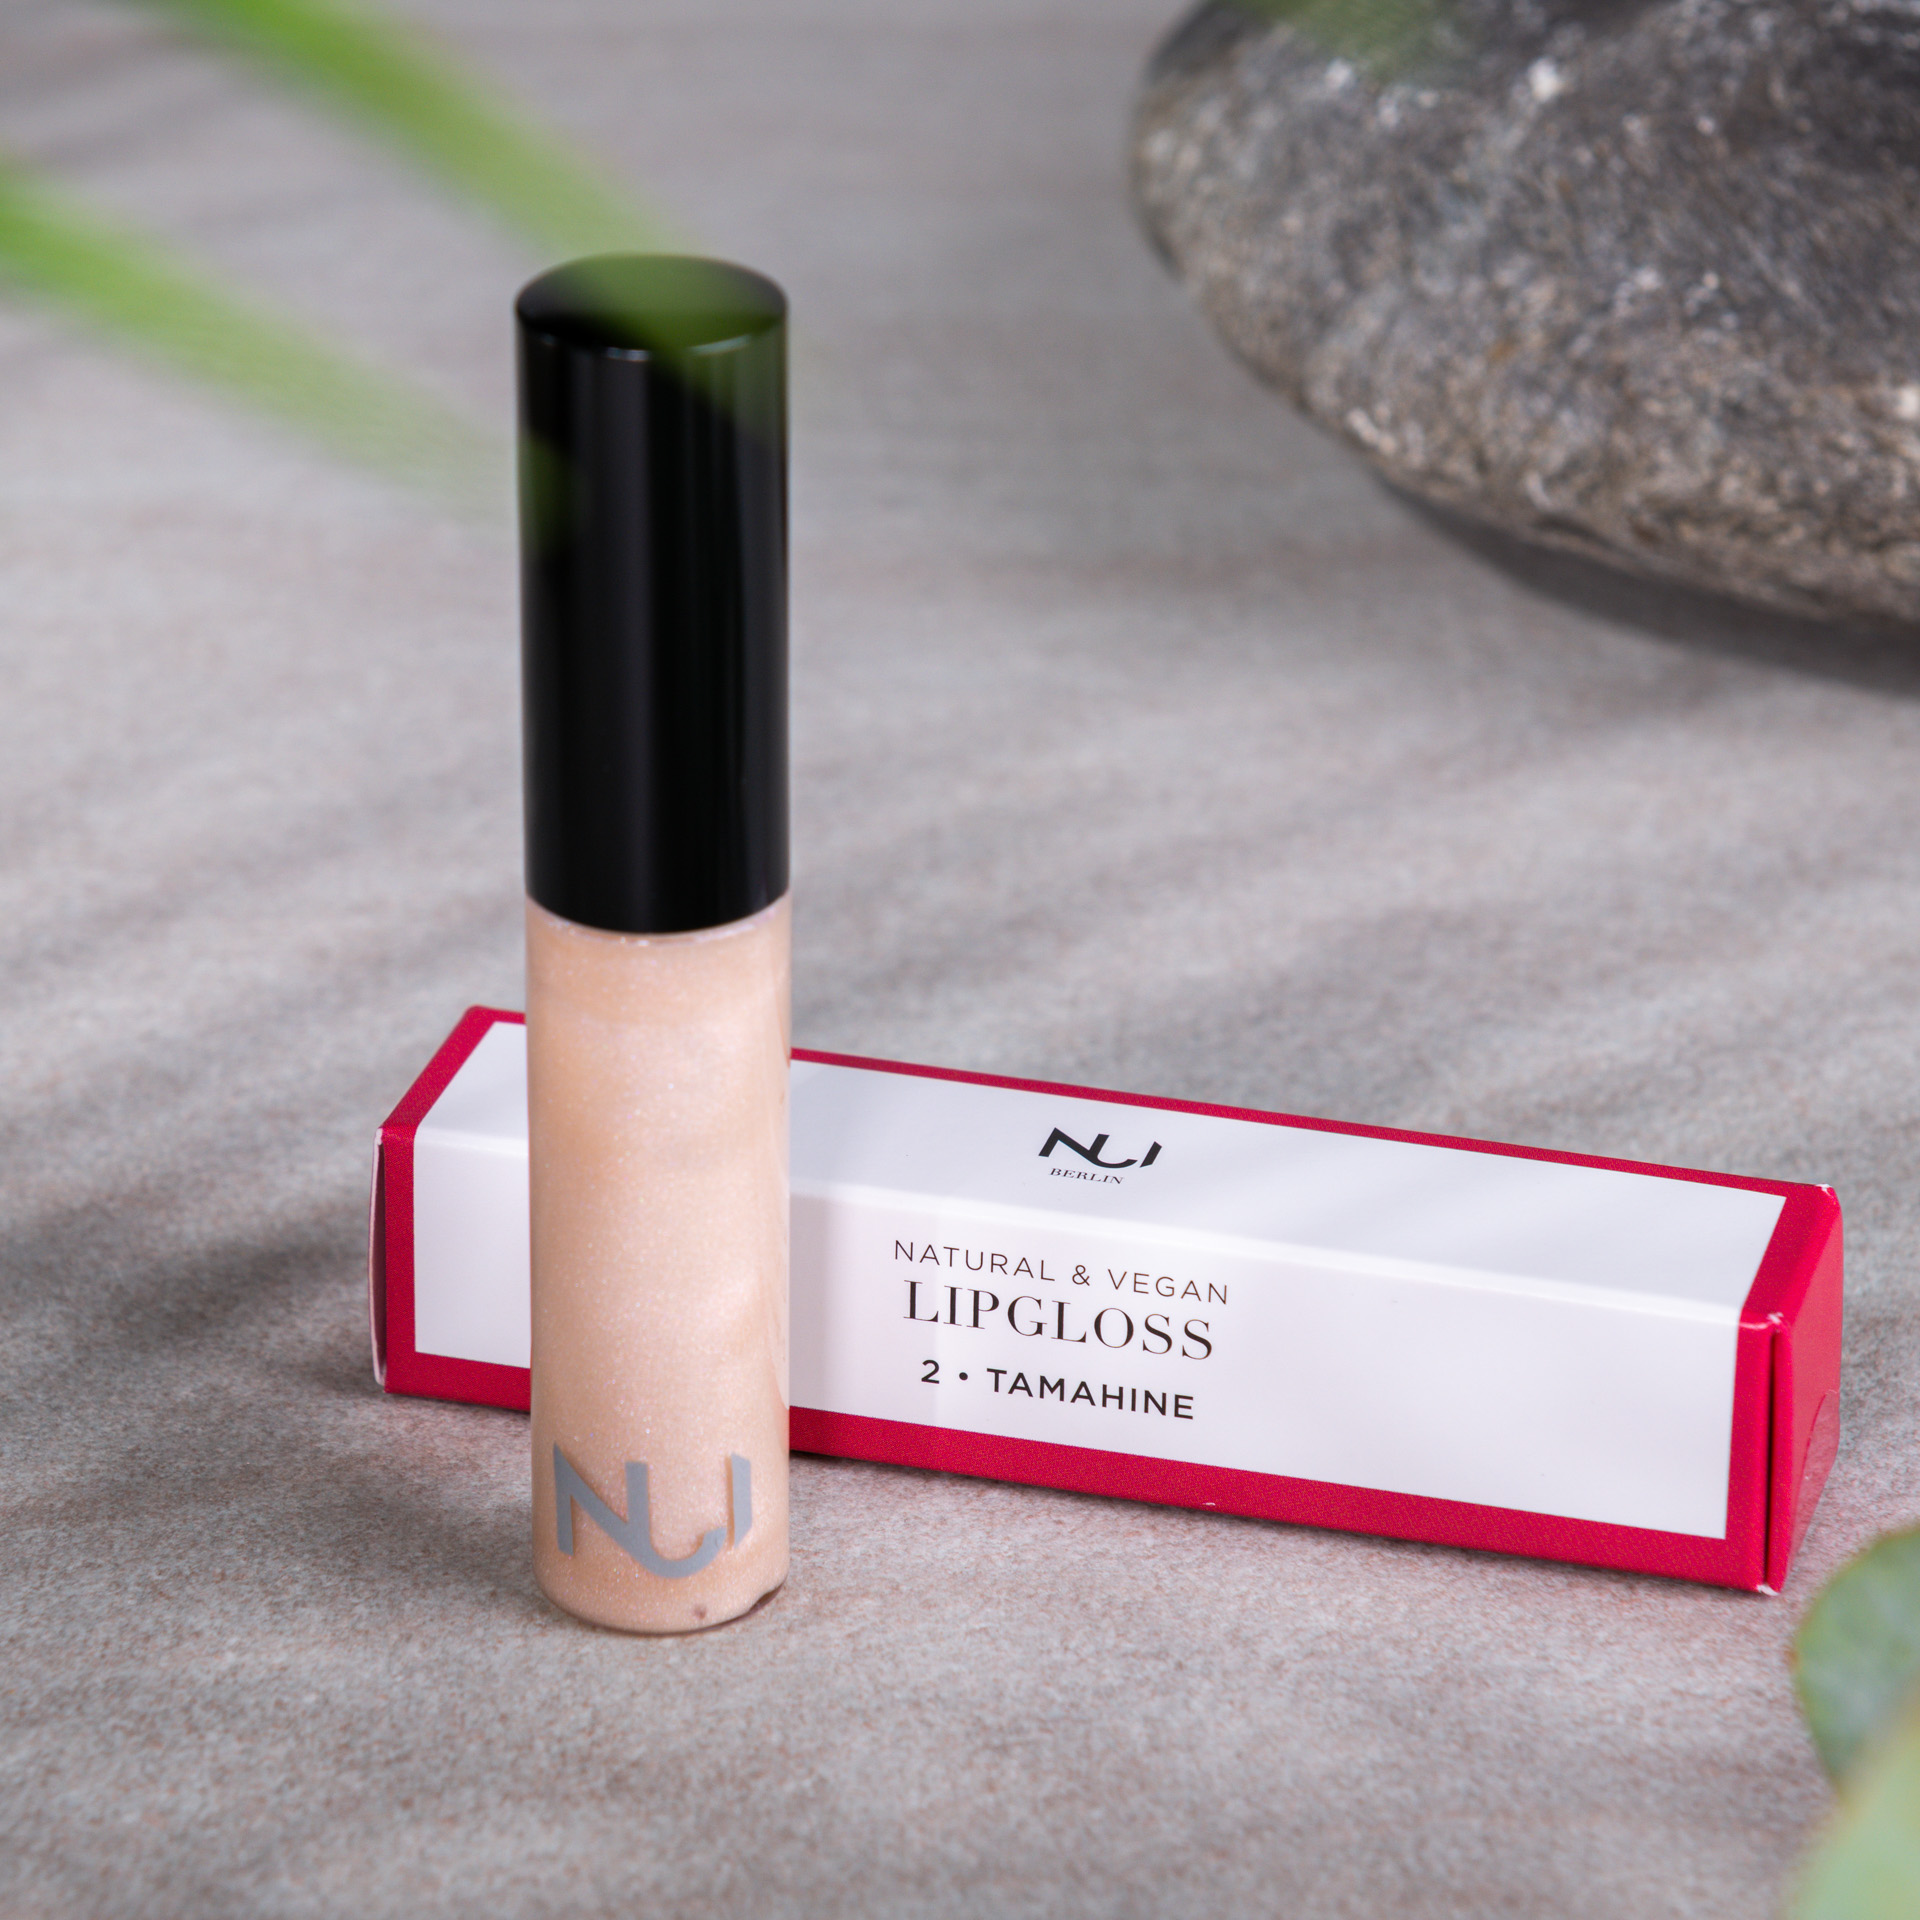 NUI Natural Lipgloss 2 TAMAHINE